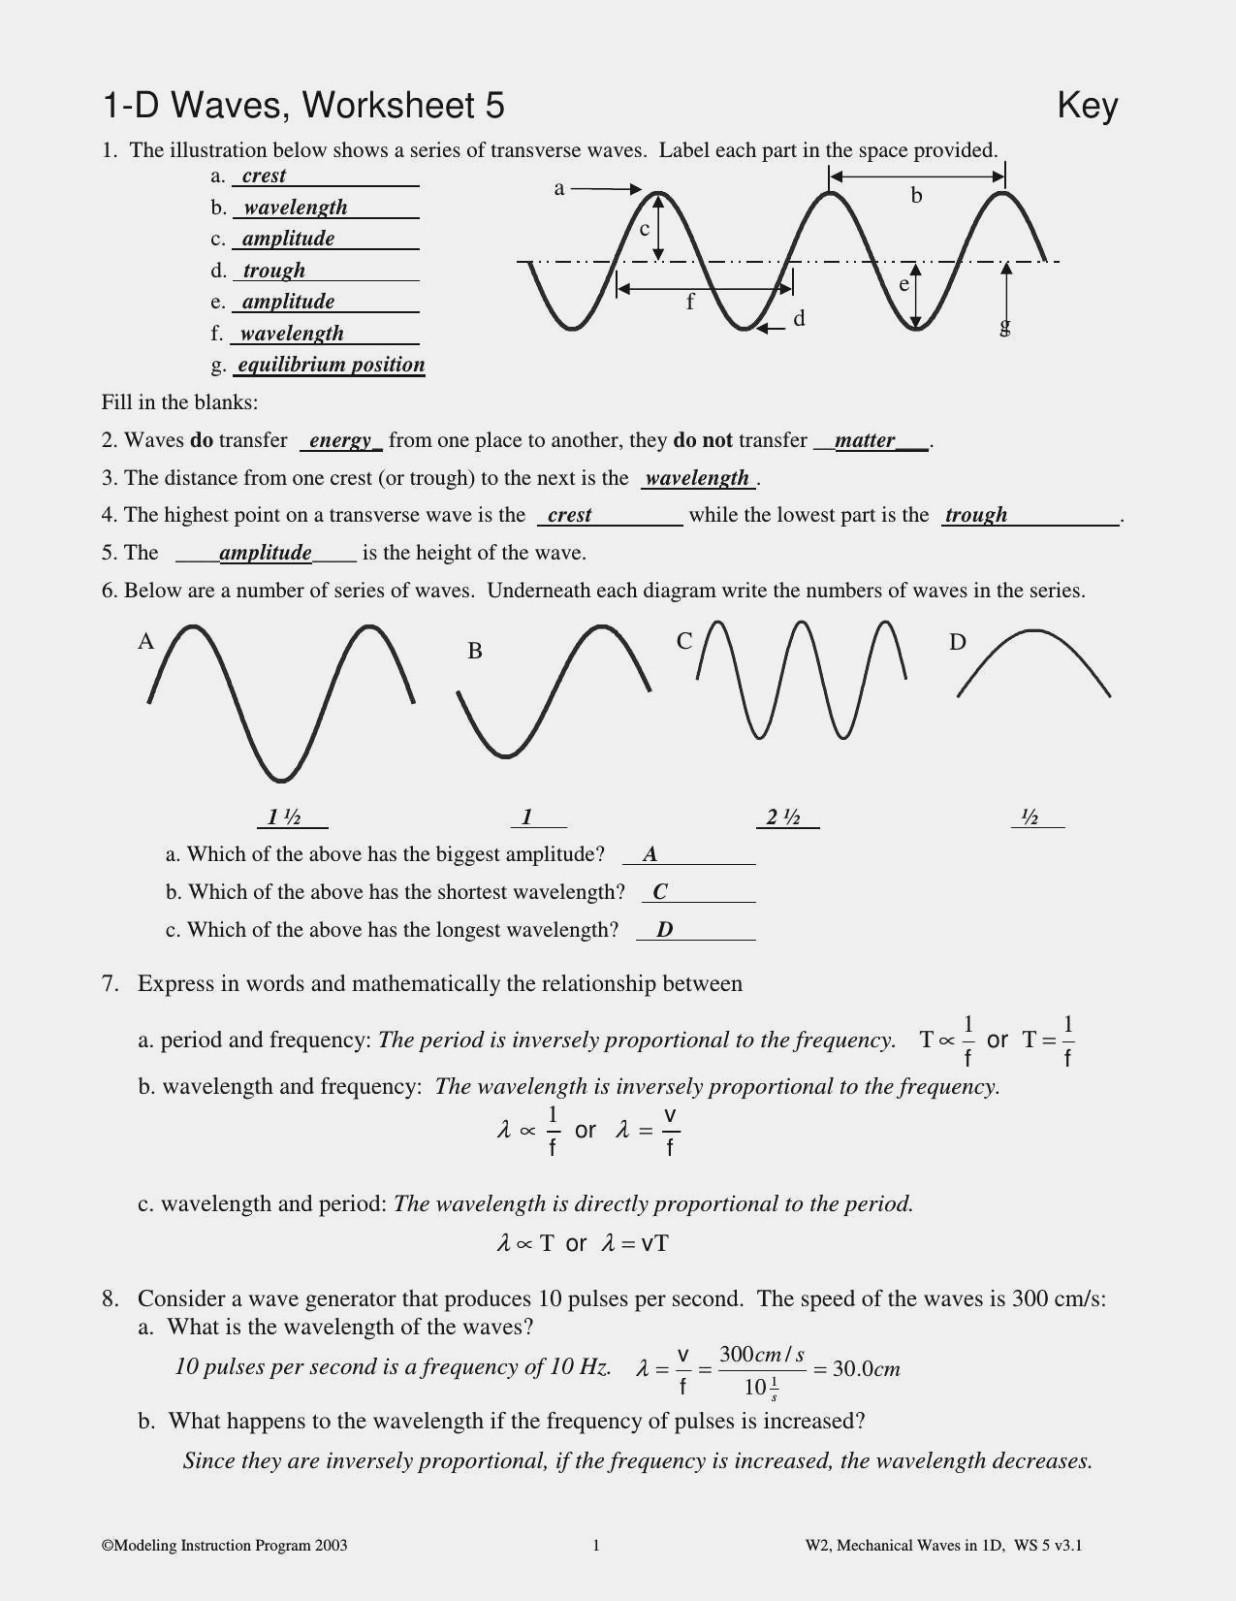 Waves Worksheet Answer Key 33 Waves Worksheet Answer Key Free Worksheet Spreadsheet